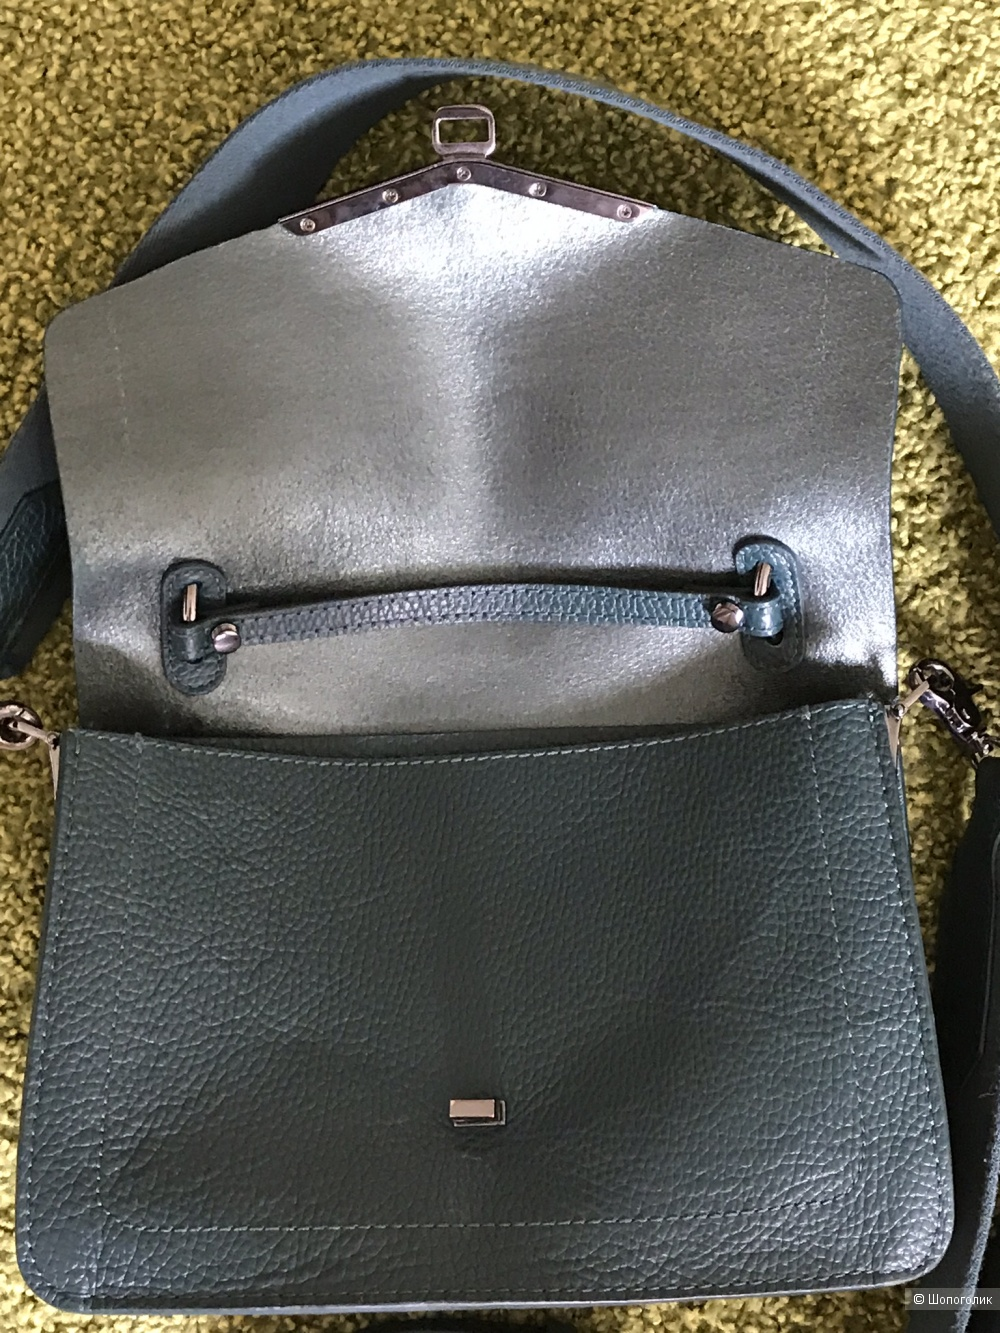 Botkier Valentina Flap satchel